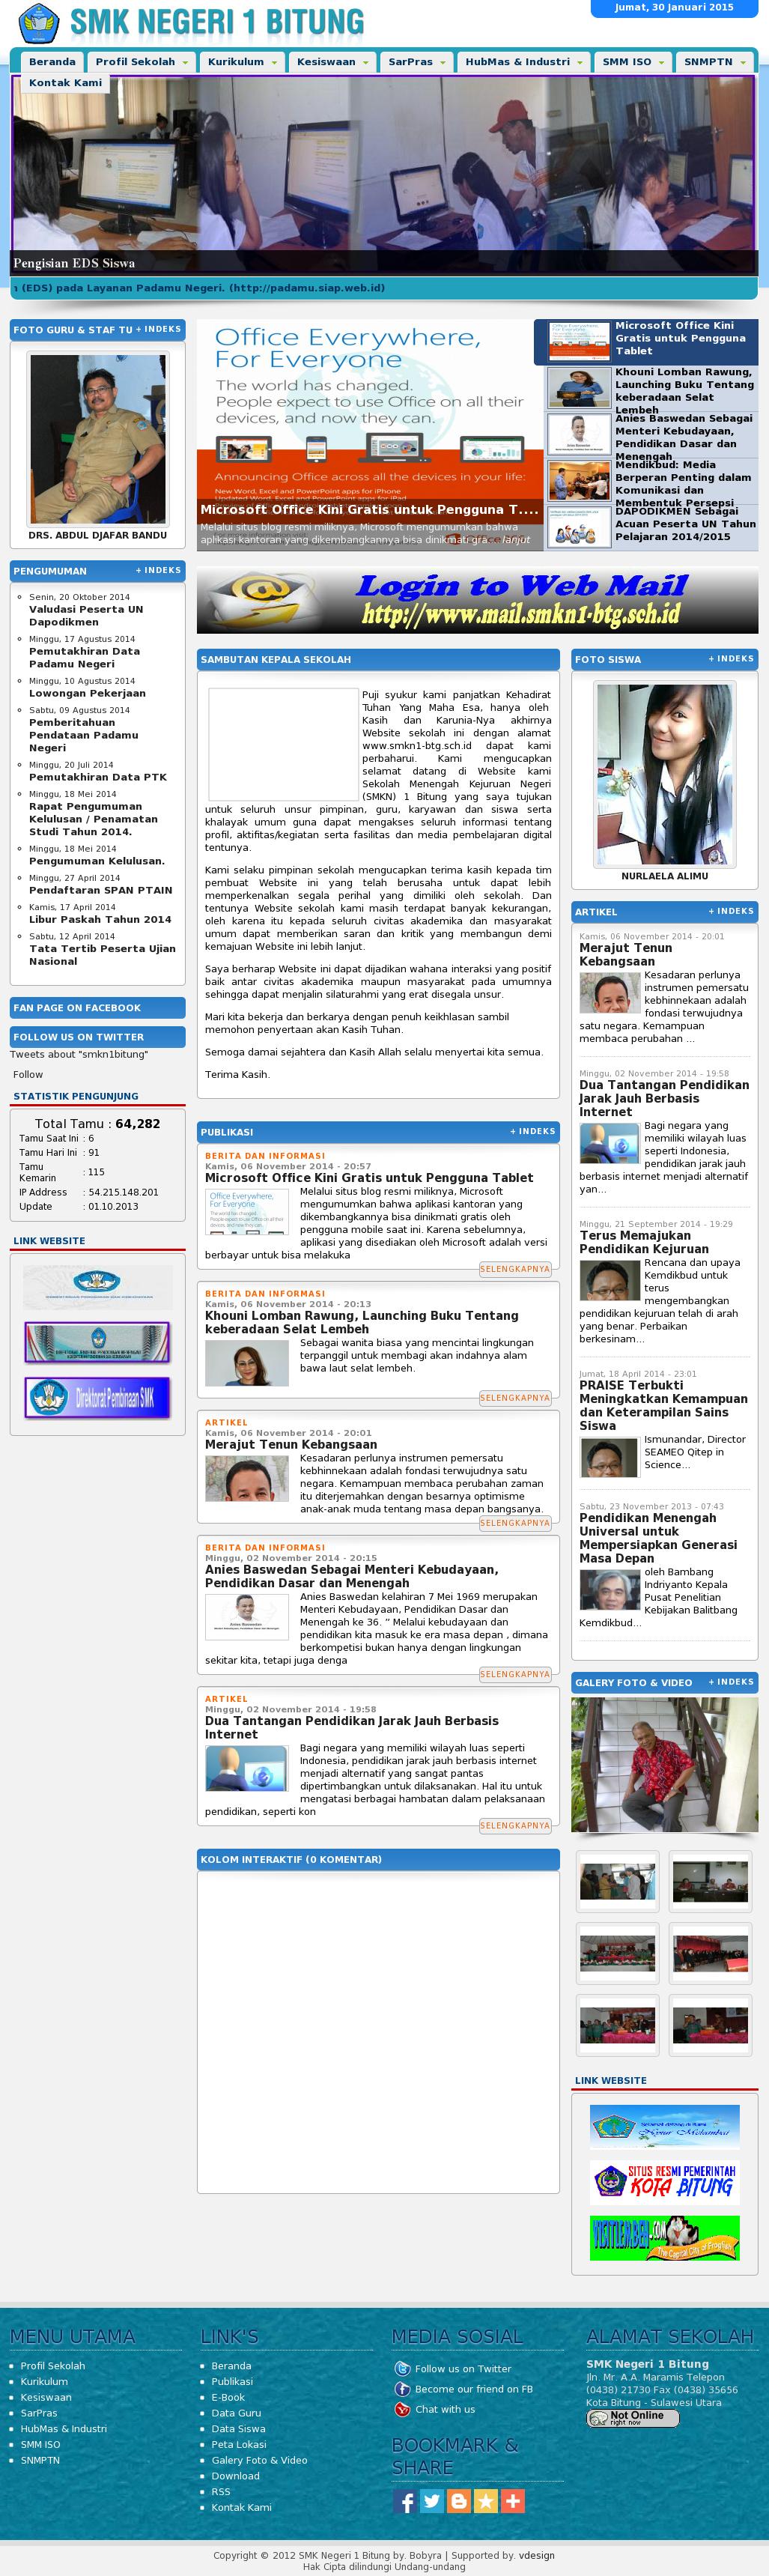 Smk Negeri 1 Bitung Competitors, Revenue and Employees - Owler ...